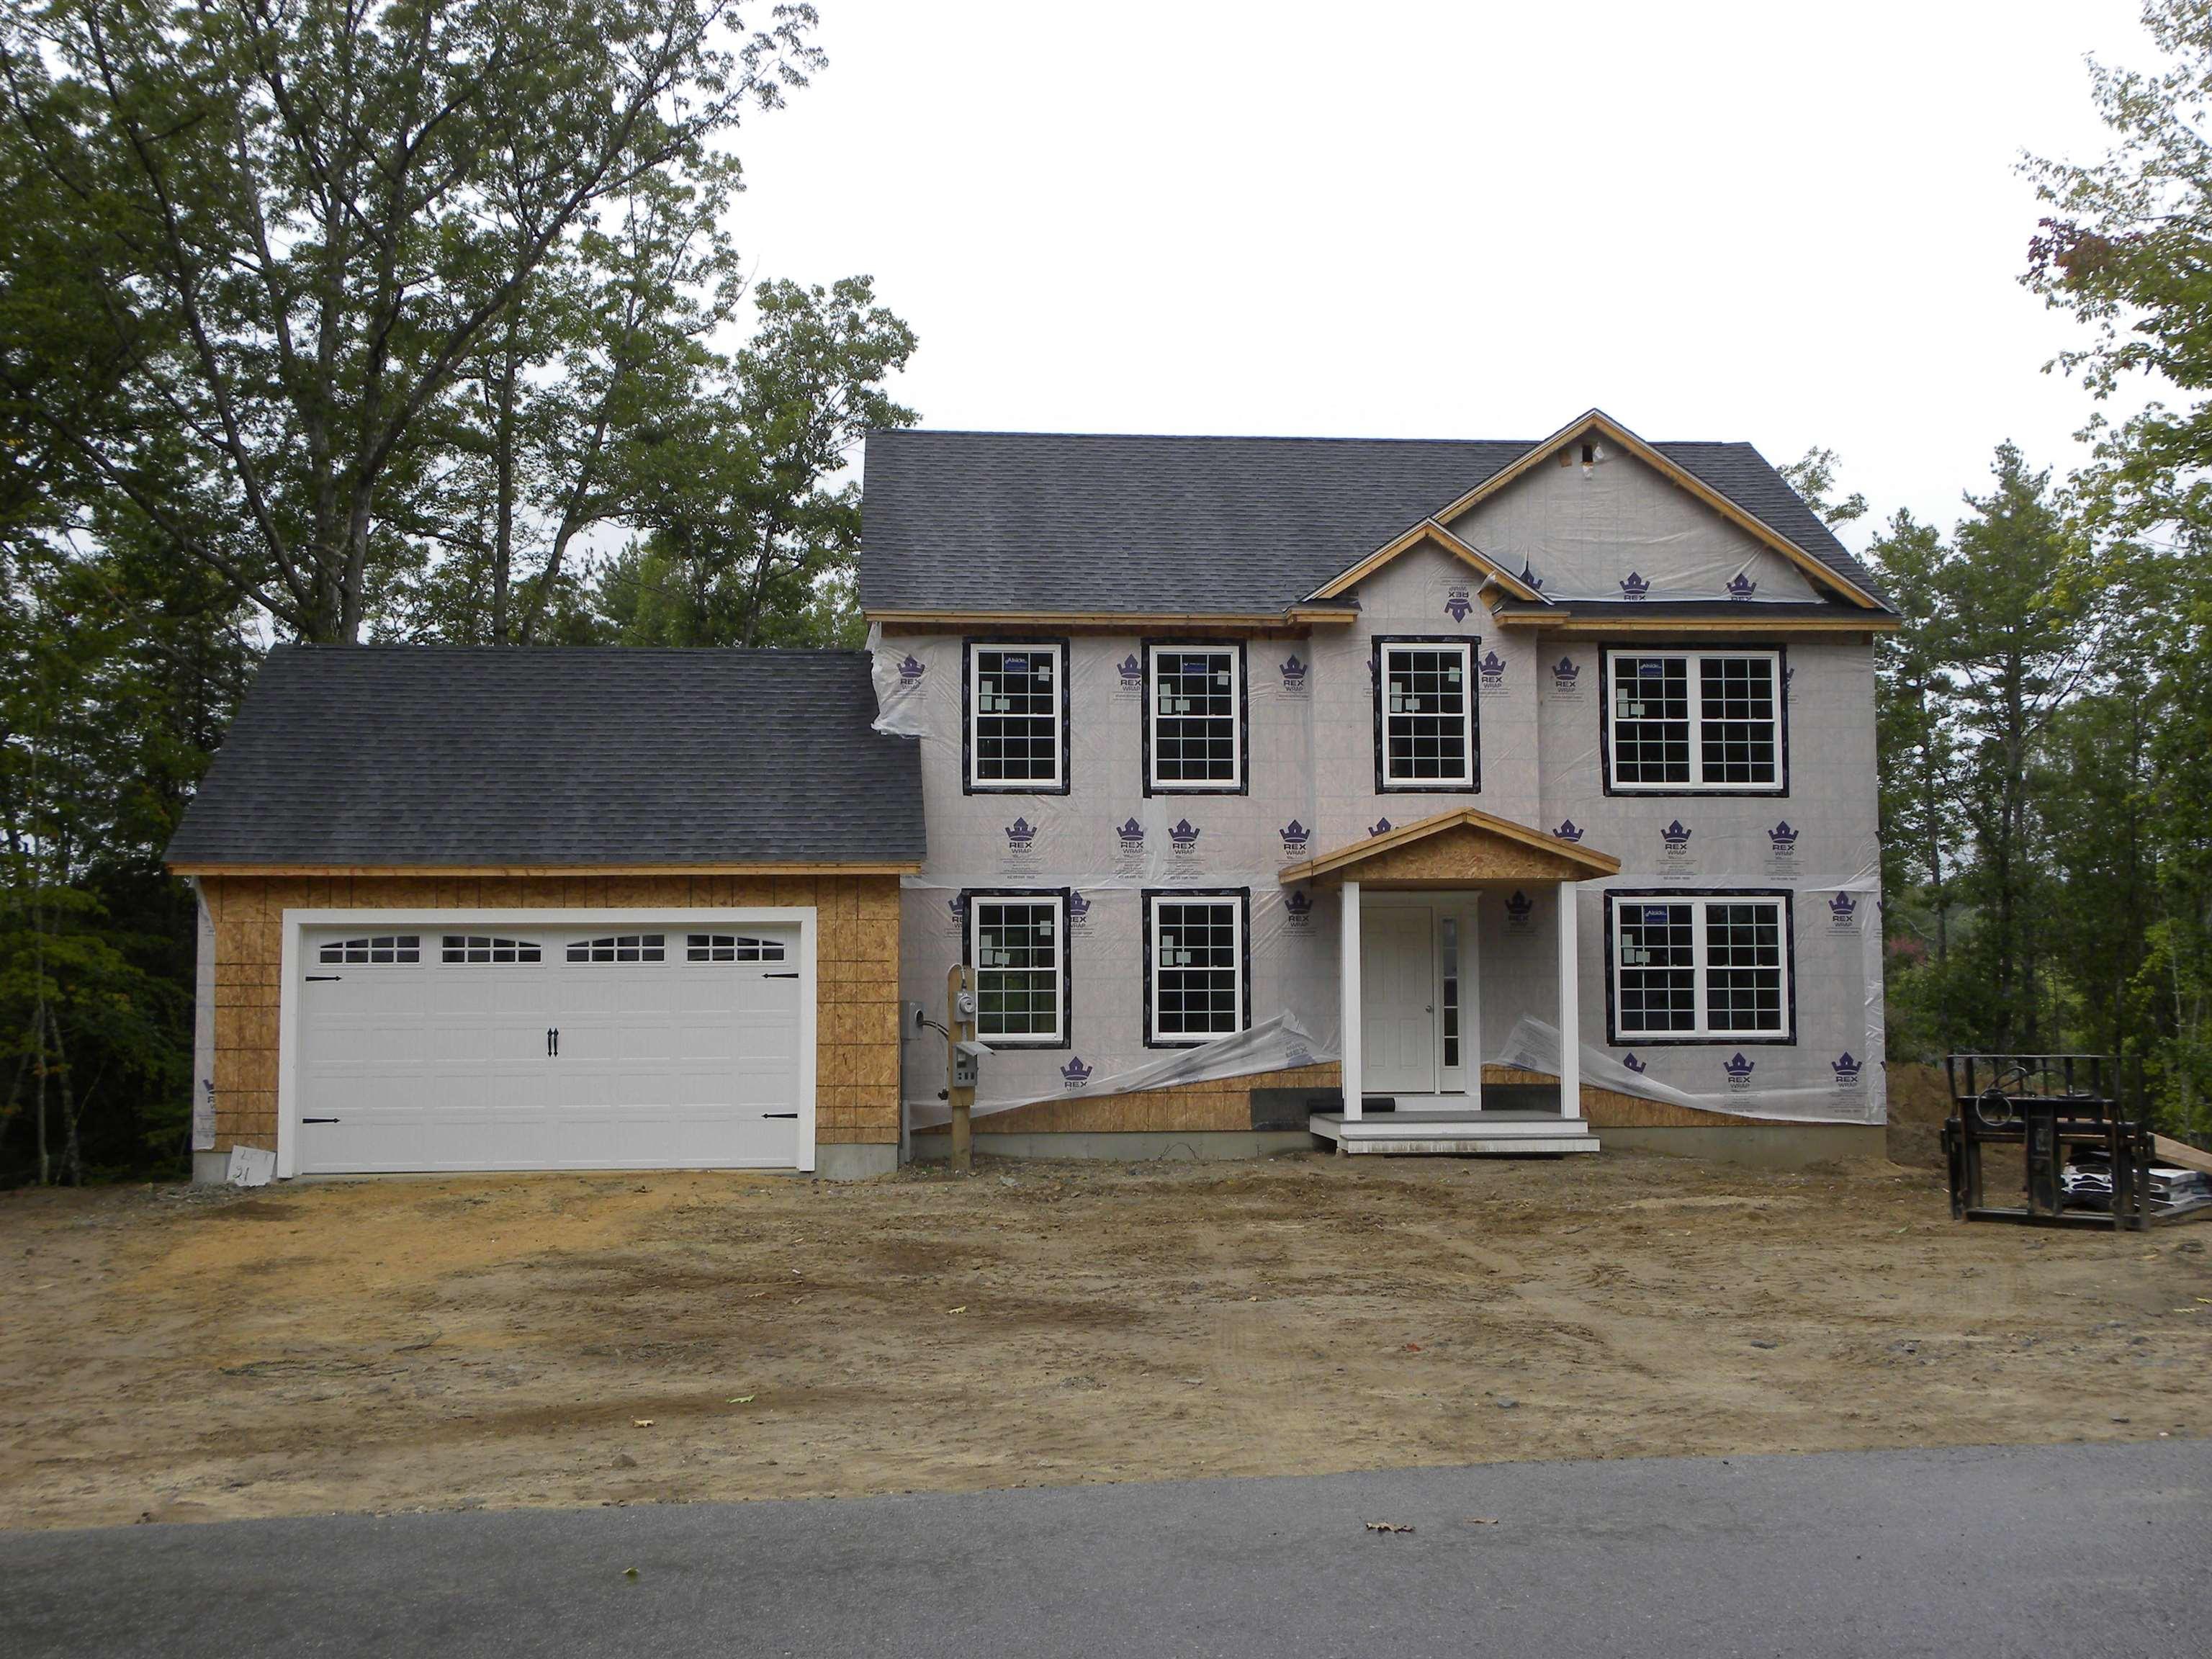 32 Sandybrook Drive Lot 21, Raymond, NH 03077